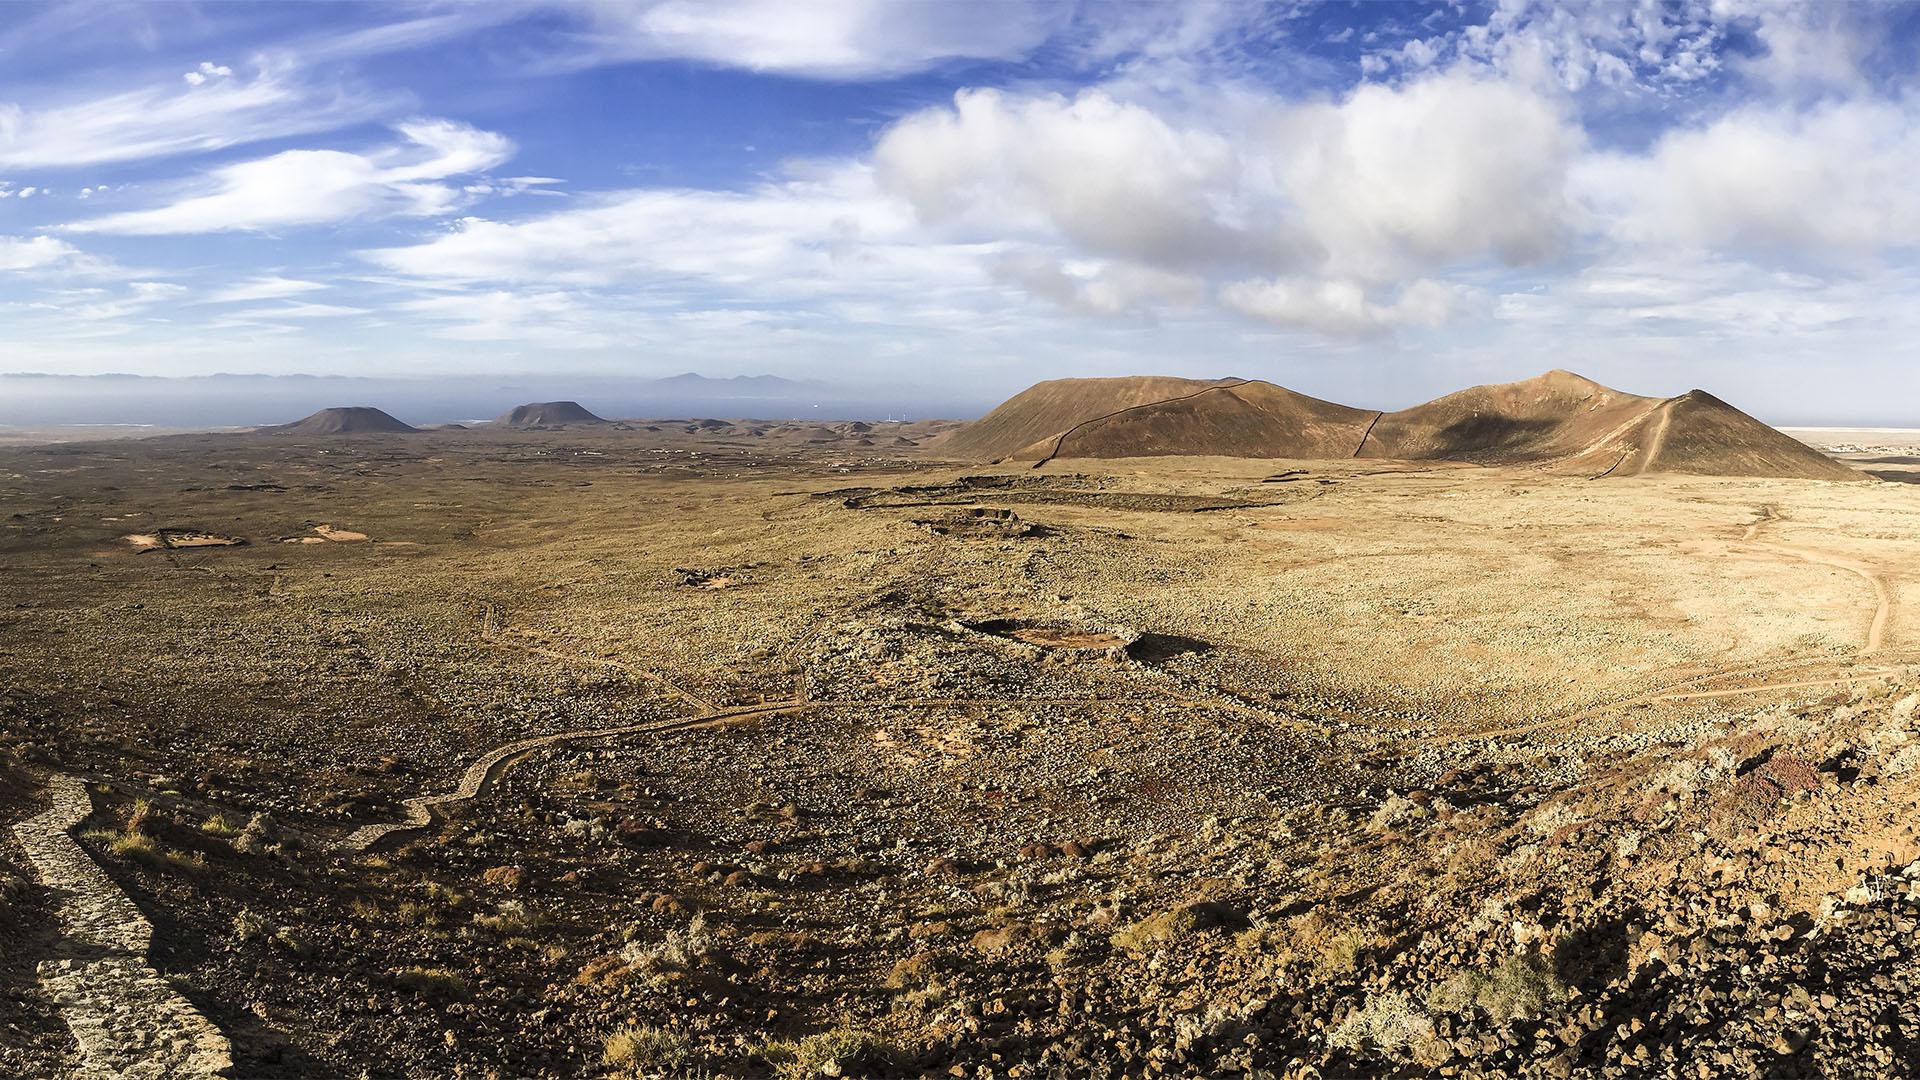 Montaña Calderón Hondo Lajares Fuerteventura.